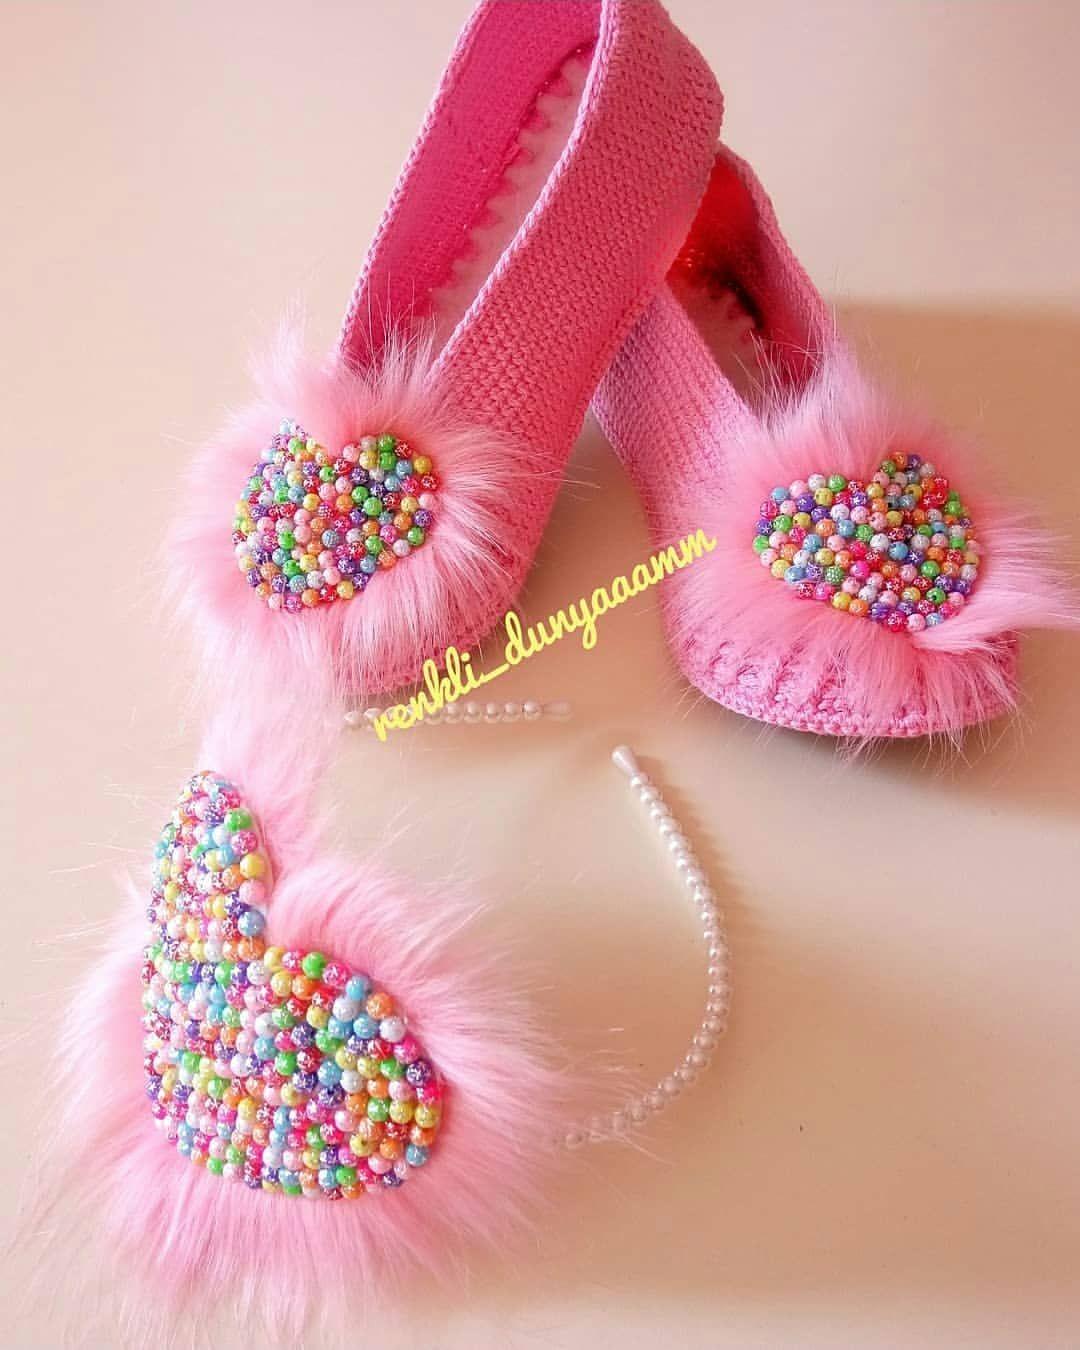 ???? ???? Yaa ben bunlara bayıldım ???? ???? çok tatlı olmuşlar ???? @renkli_dunyaaamm ???????????????? . . . . . . #bebekyelegi#baby #amigurumis #excerpts… #crochetbabyboots